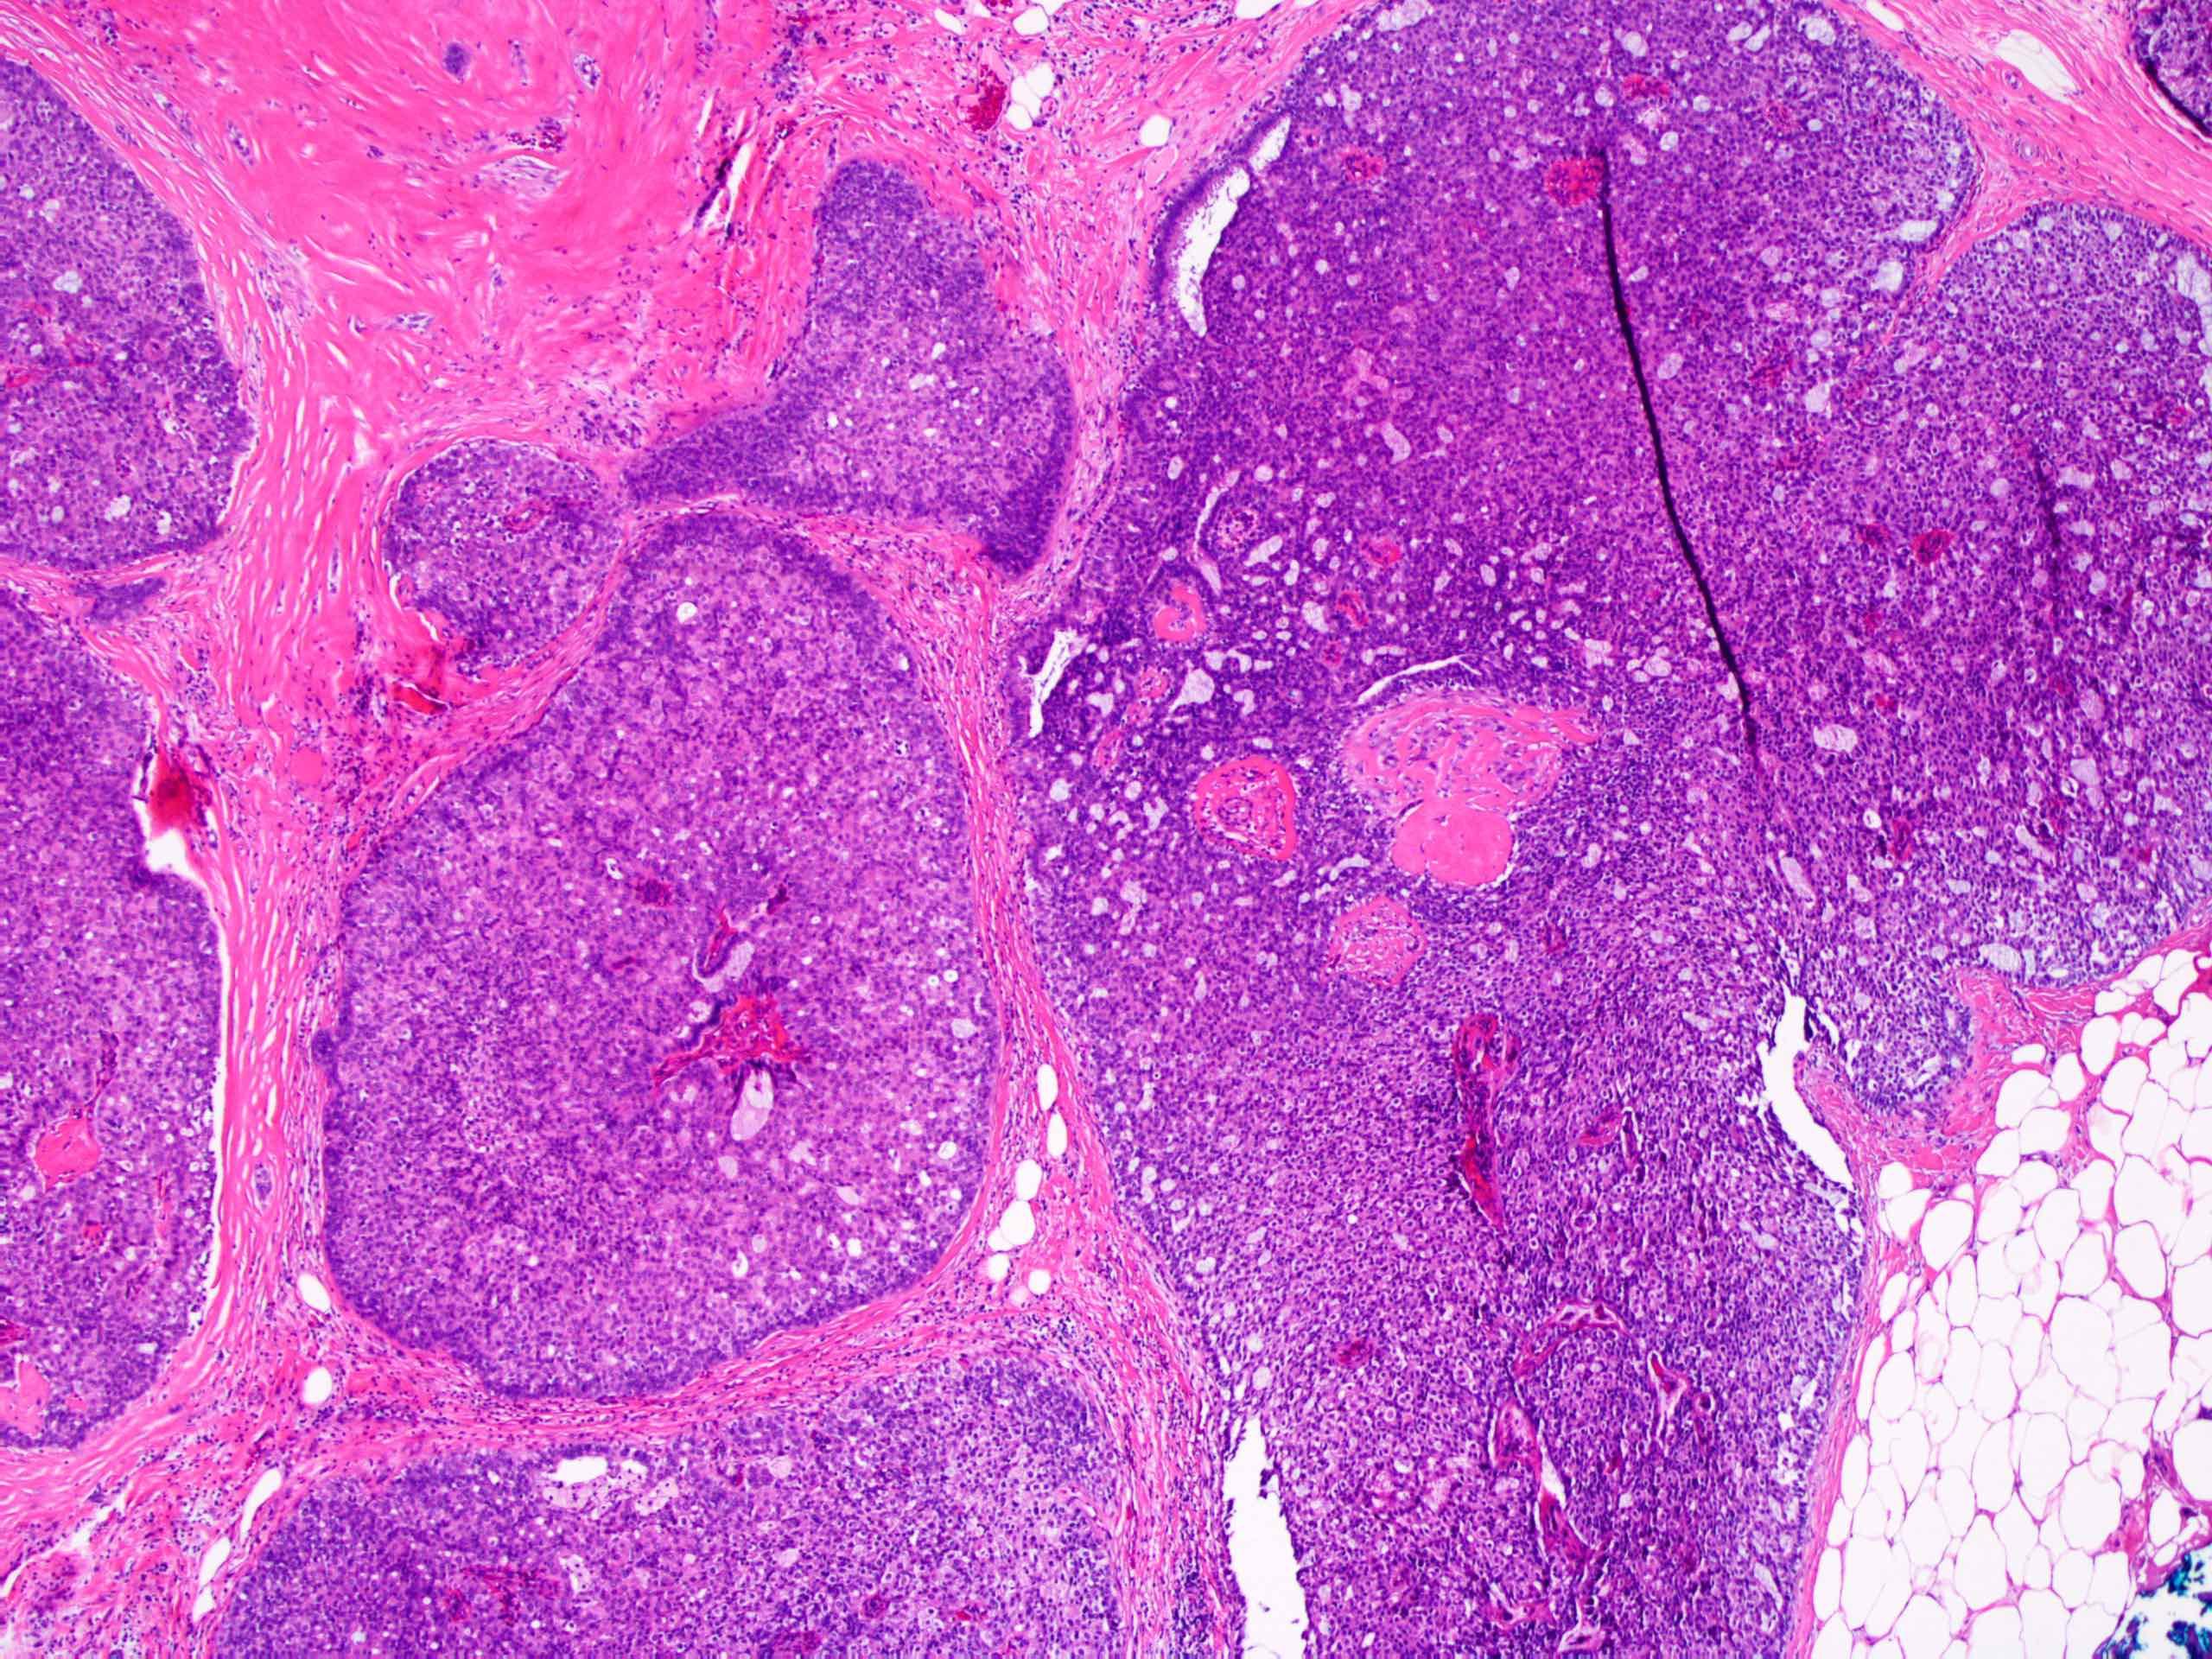 atipikus ductalis papilloma genitális herpesz papilloma vírus